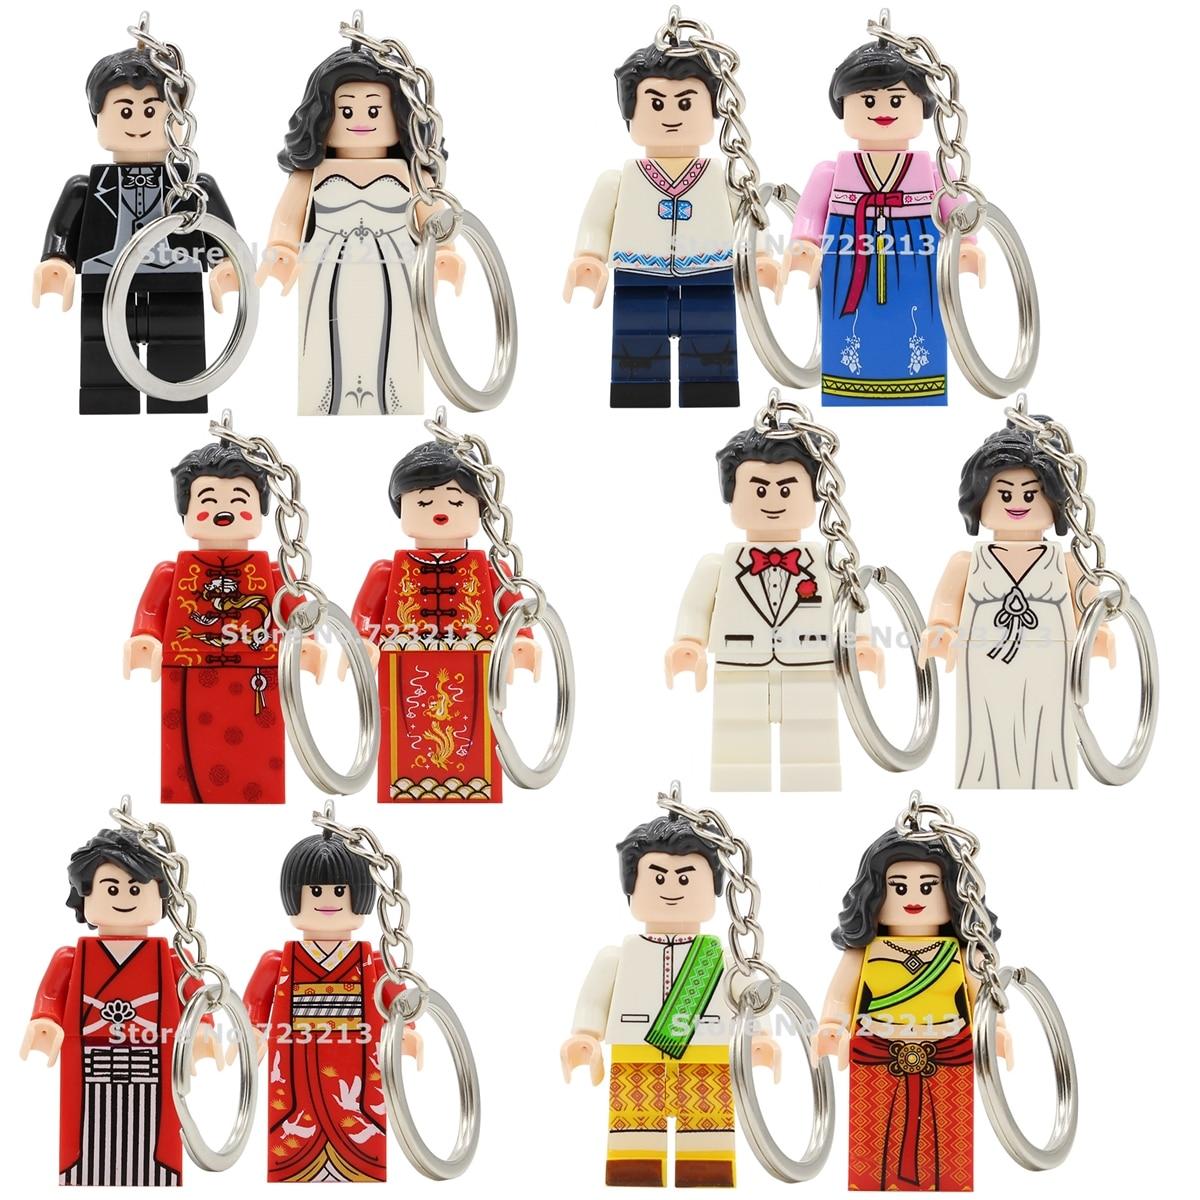 Couple Bride Bridegroom Keychain Figure Set JP Korea India Europe Wedding Gift Key Ring Building Blocks Bricks Toys